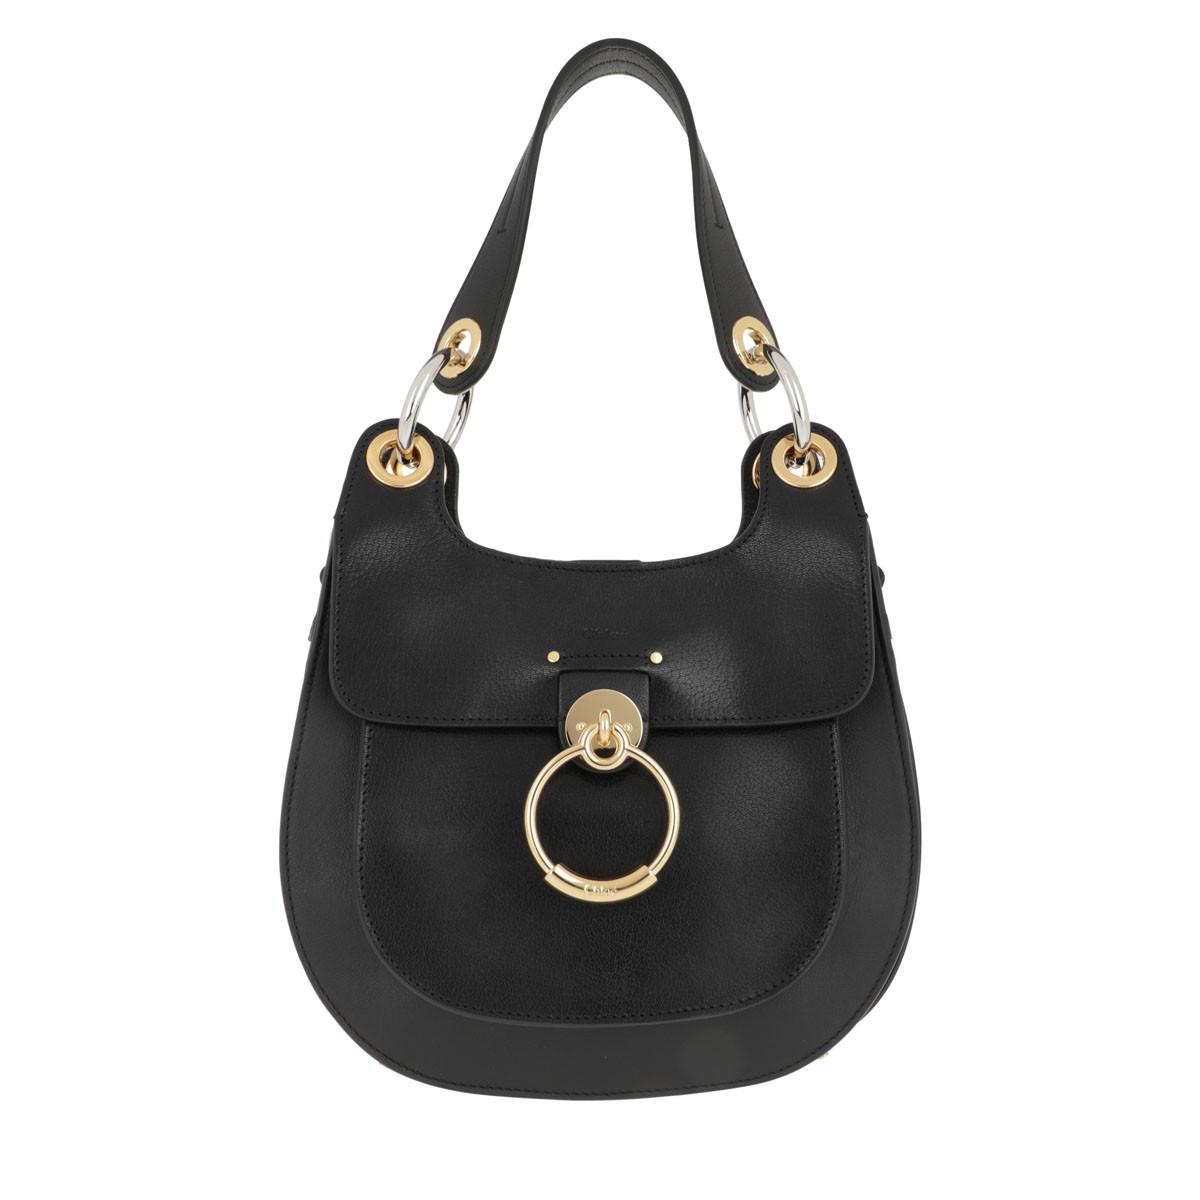 Chloé Satchel Bag - Tess Hobo Bag Leather Black - in schwarz - für Damen